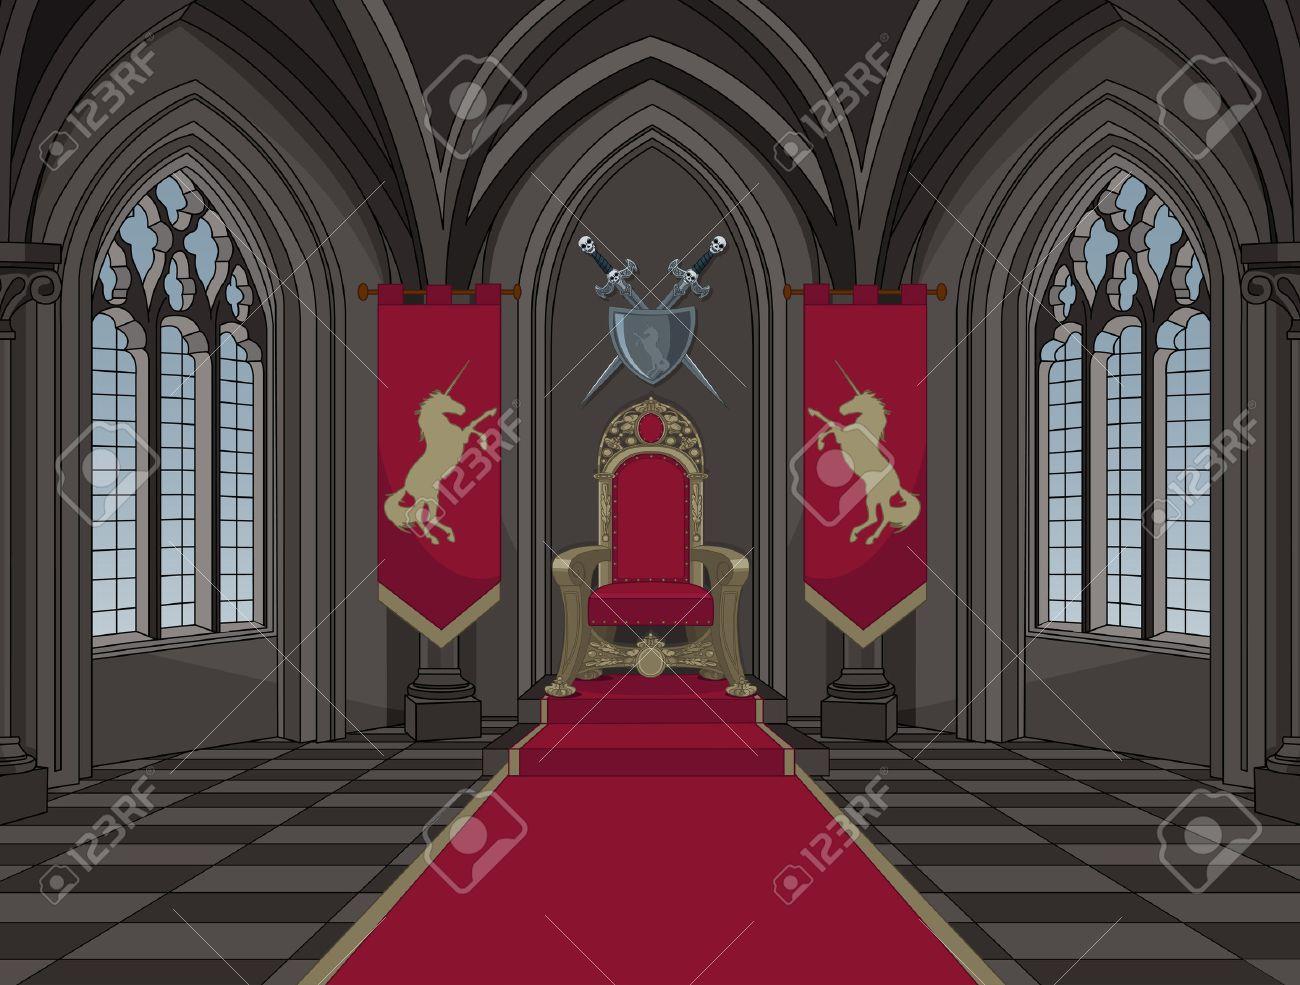 Illustration of medieval castle throne room Banque d'images - 69004071